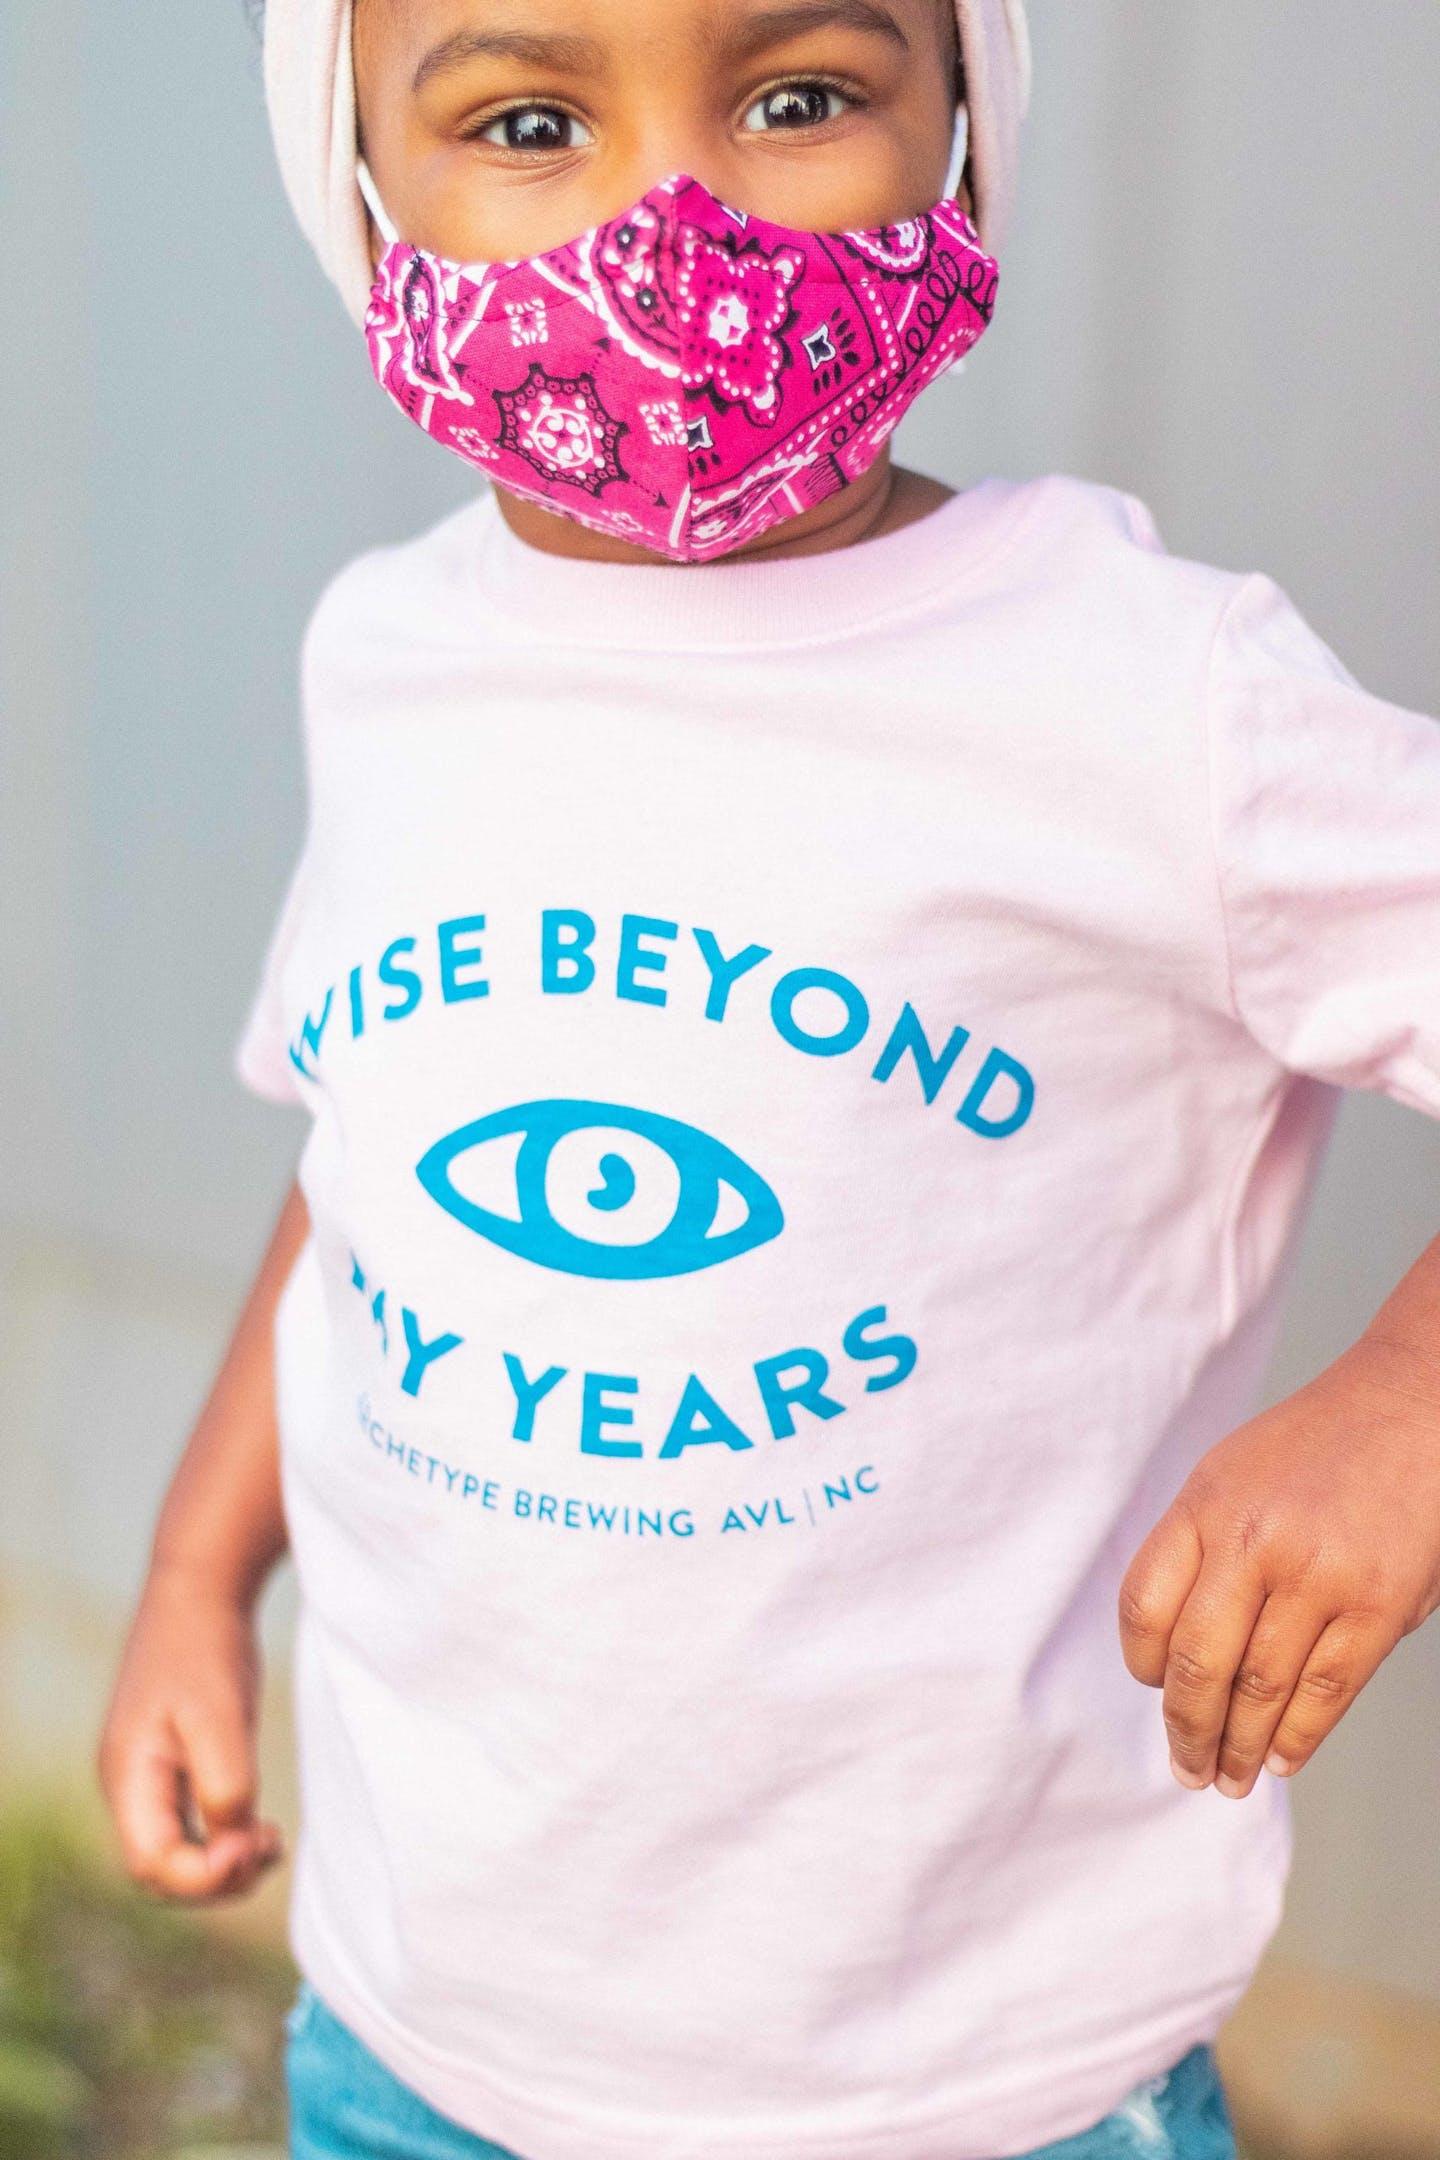 2020_Kids Shirt Inventory_ Carlos Maldonado Romero - 10